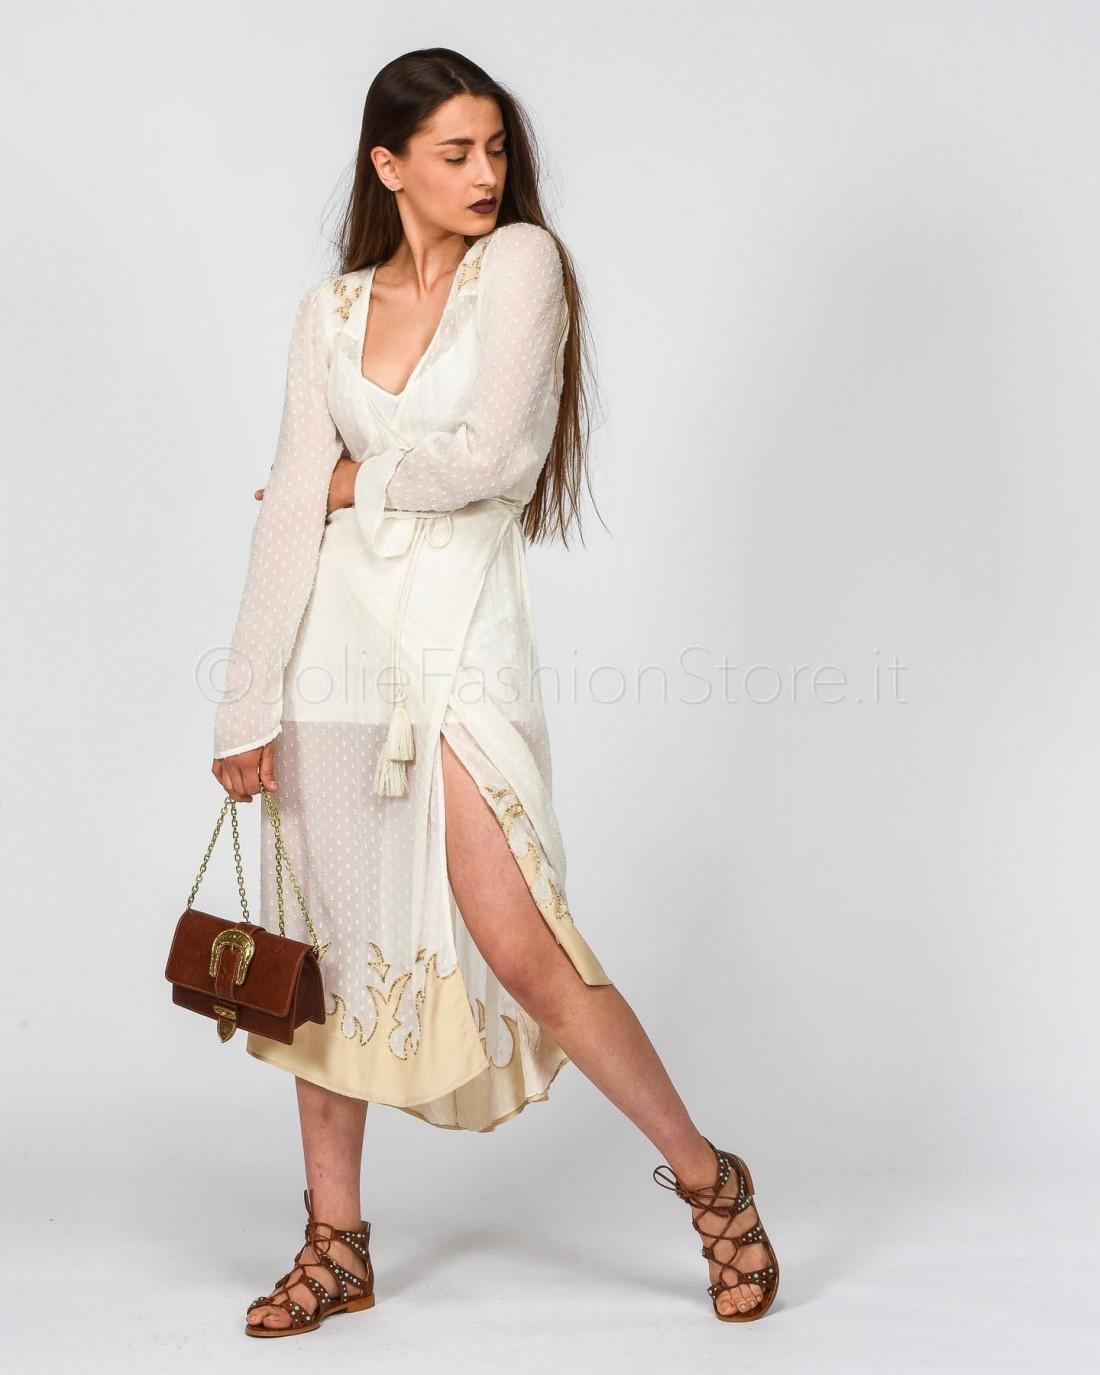 Gina Gorgeous Abito in Tulle Nero con Pizzo Bianco b6f1c3d4246